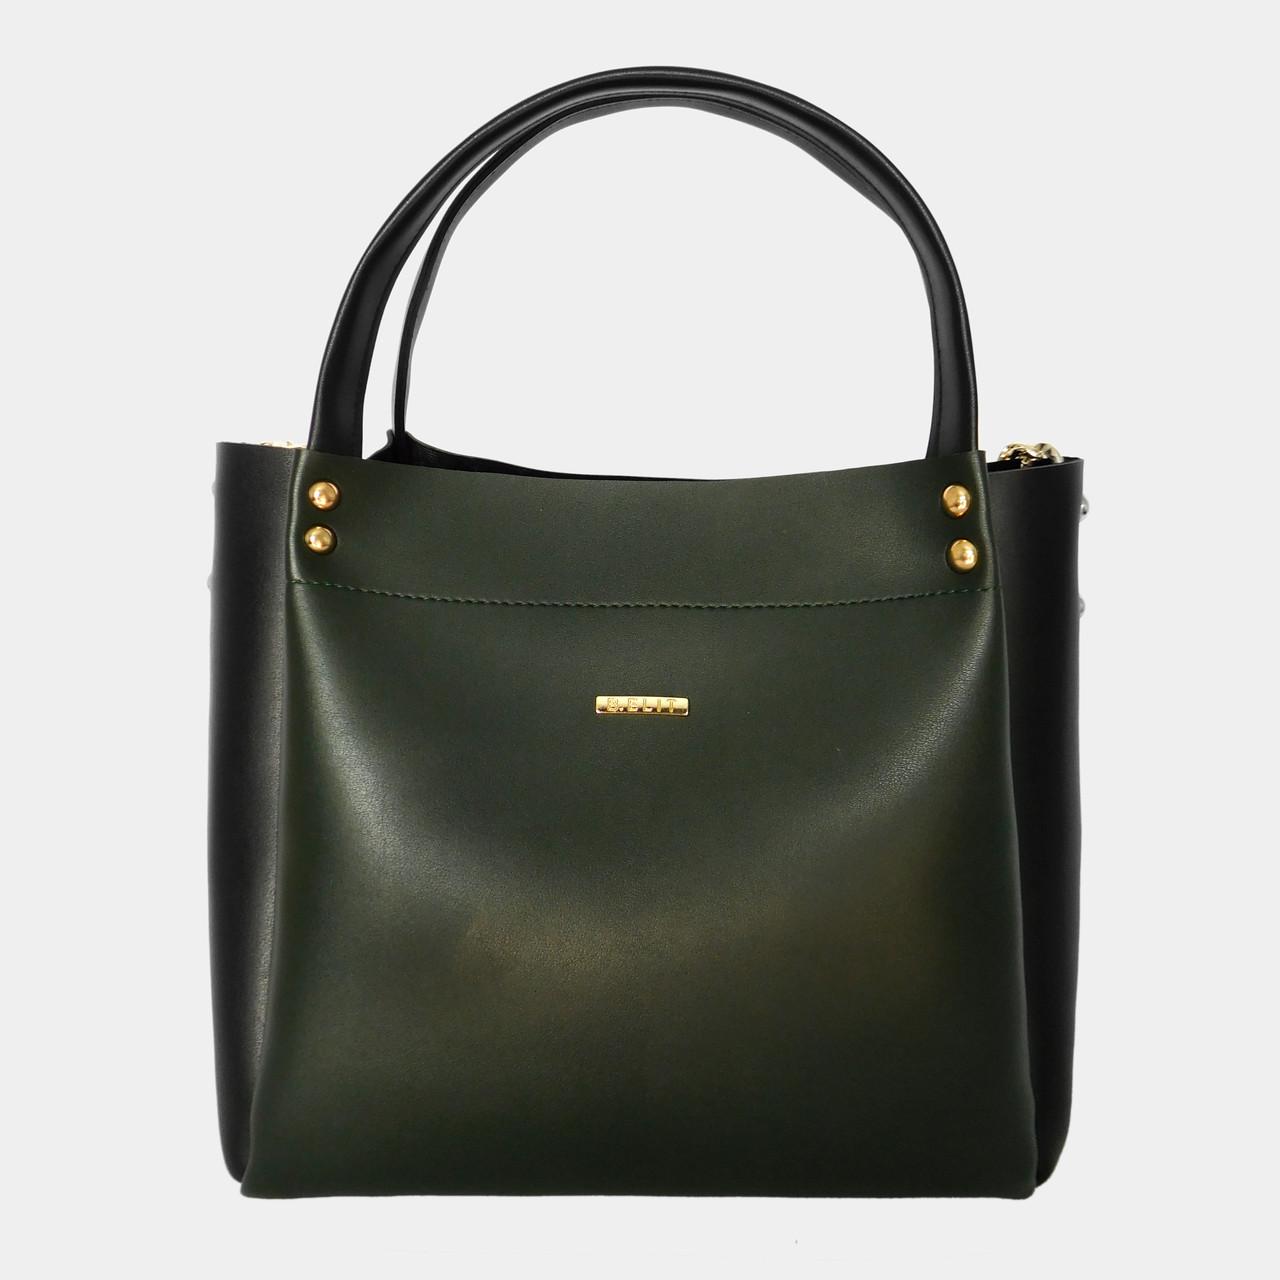 Сумка жіноча зелена з екошкіри (чорні вставки)   Сумка женская зеленая из  экокожи (черный вставки) b18876ccc6927